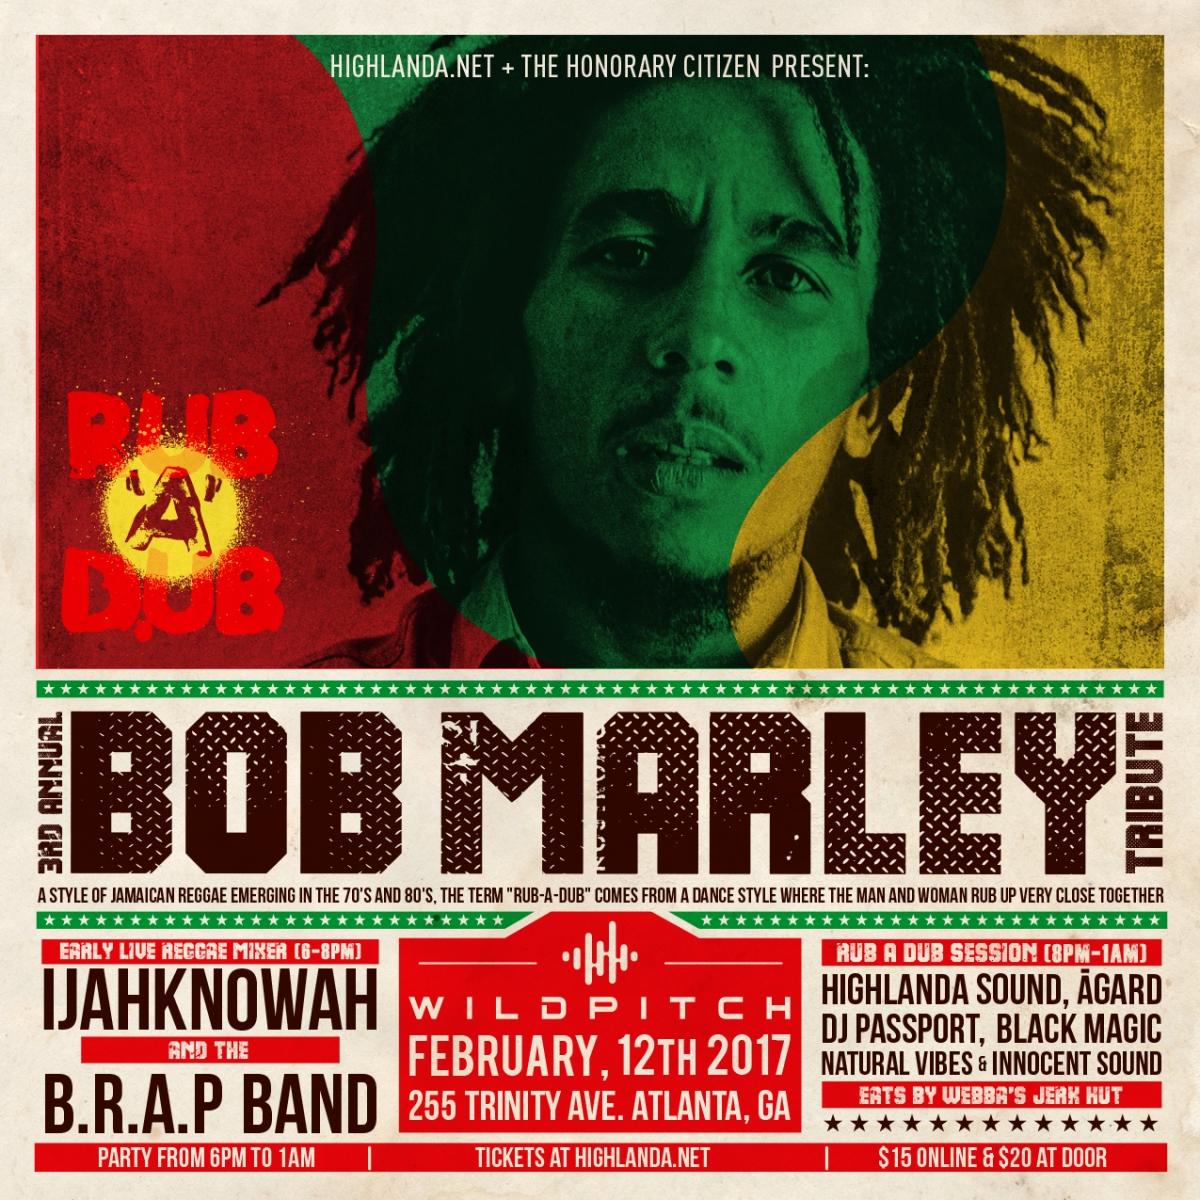 Bob Marley 72nd Birthday Bash & Musical Tribute